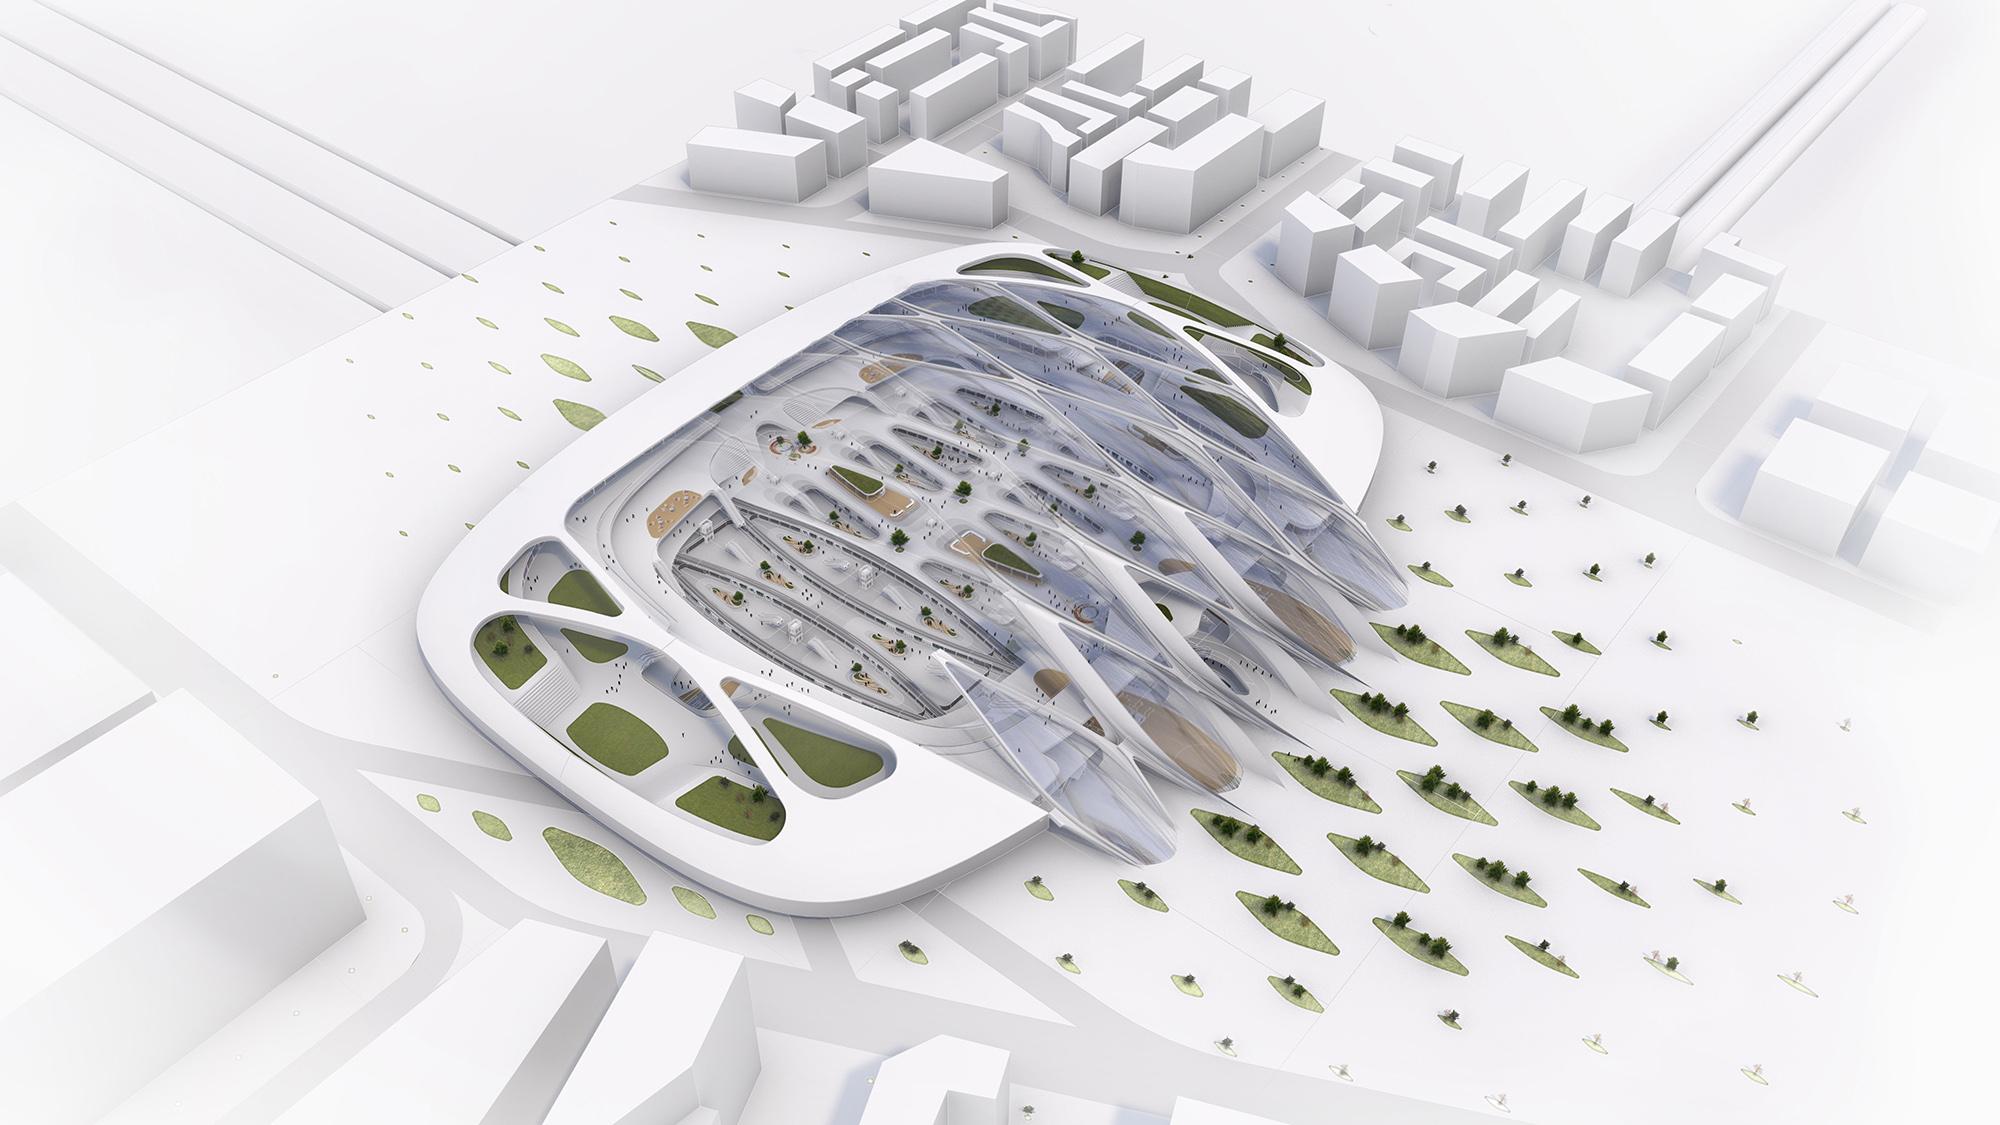 Multi-layered, modular, adaptive